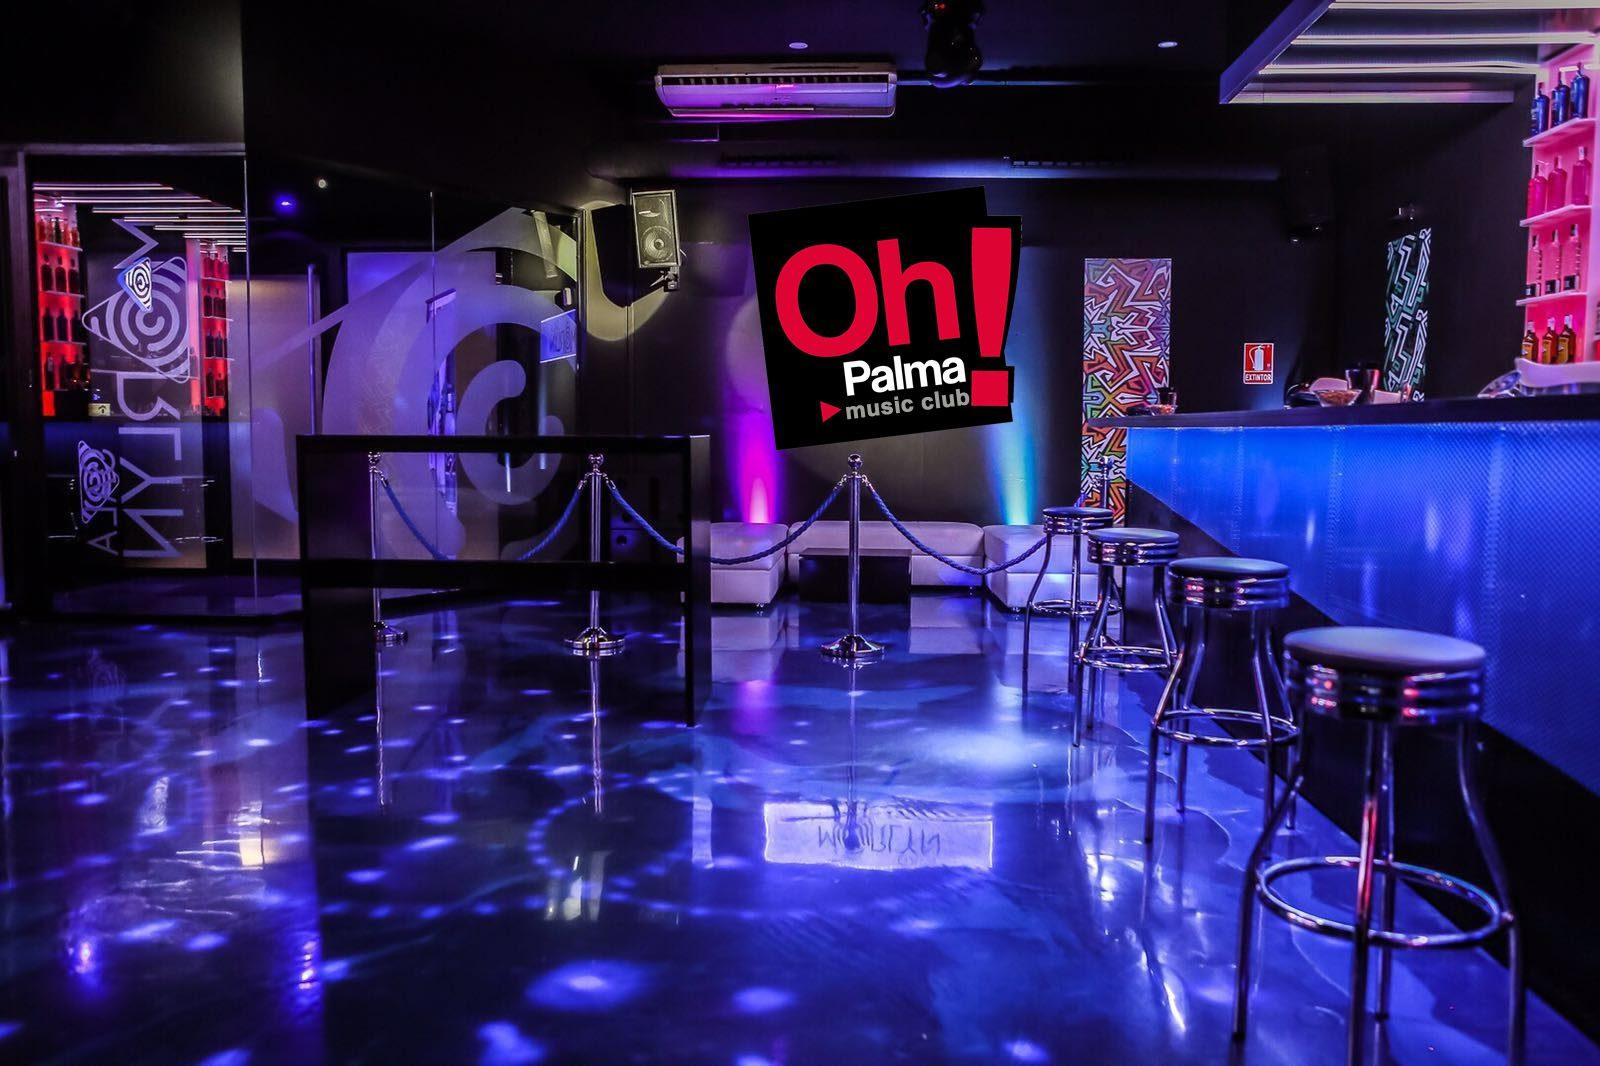 Oh! Palma music club